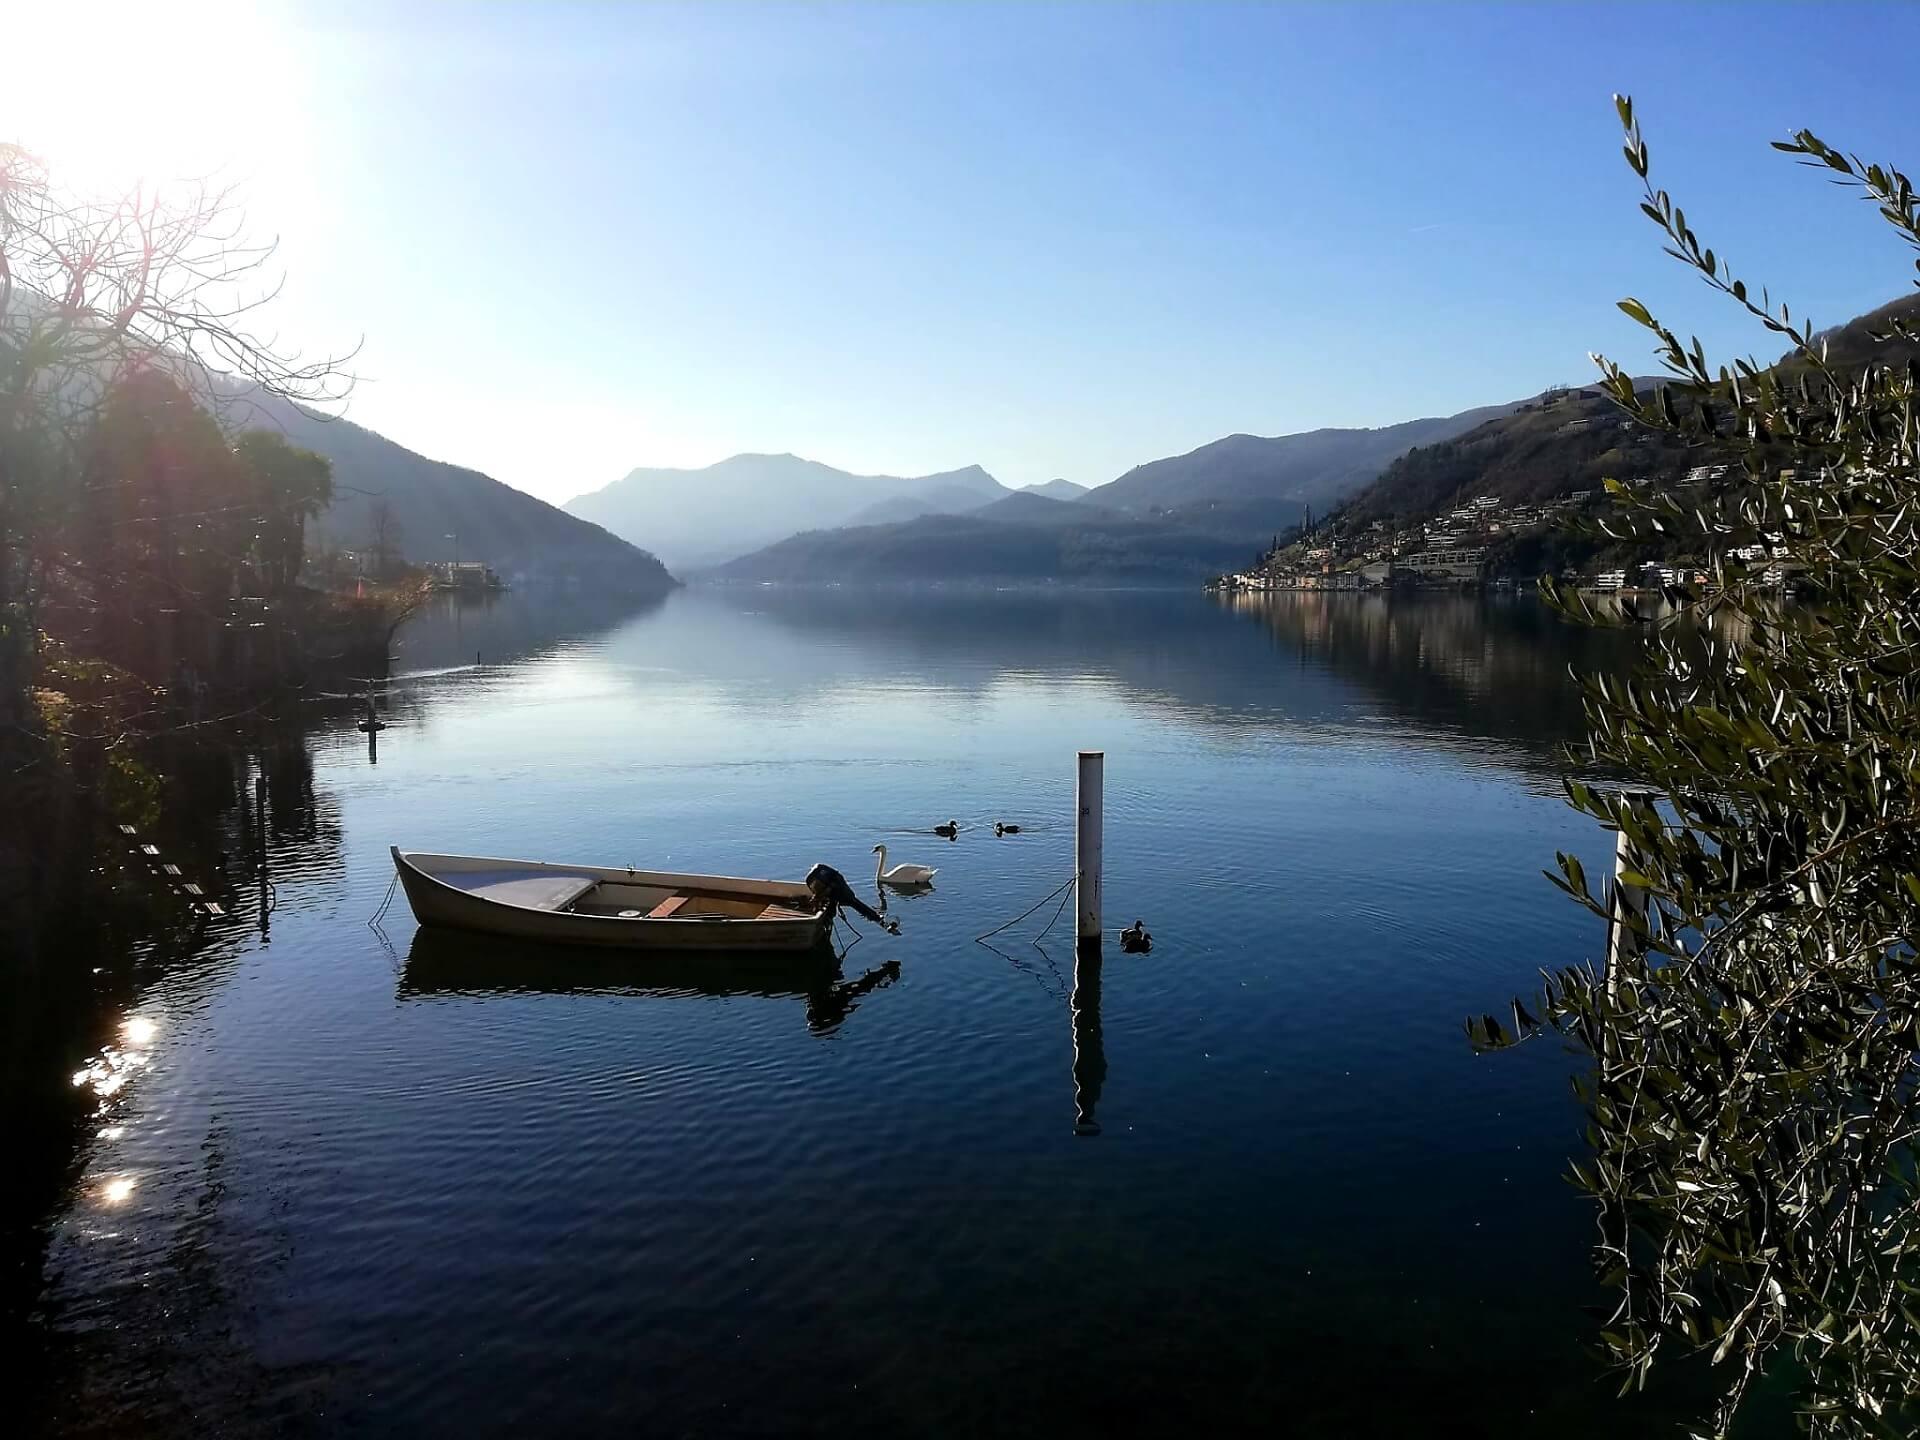 Dolceresio Lugano Lake B&B, Brusino Arsizio - Über uns - 12 gennaio 2020 2